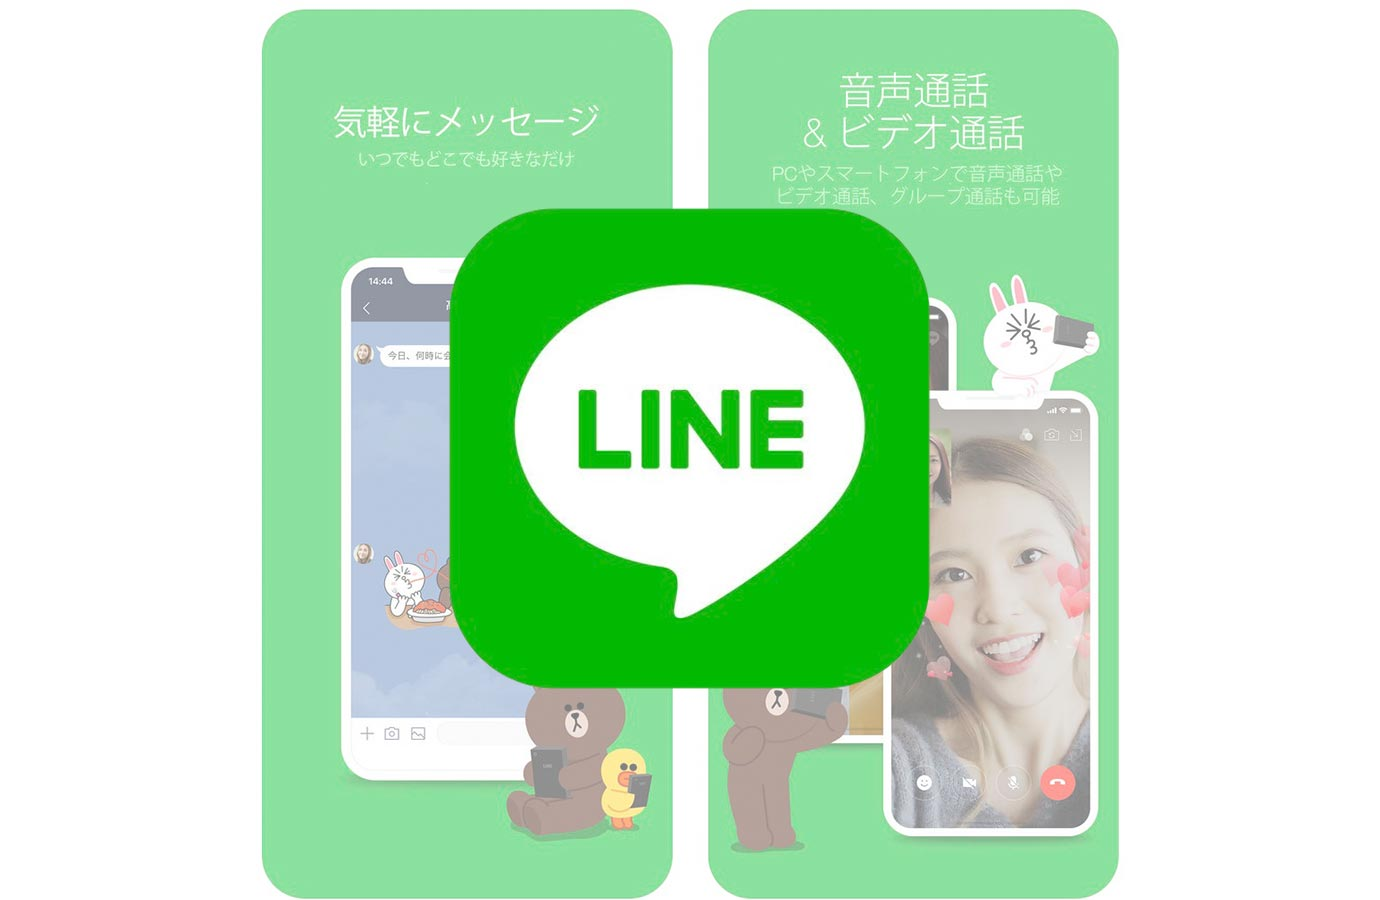 LINE、iOSアプリ「LINE 8.2.0」でスライドショーに新しく7種類のテーマを追加